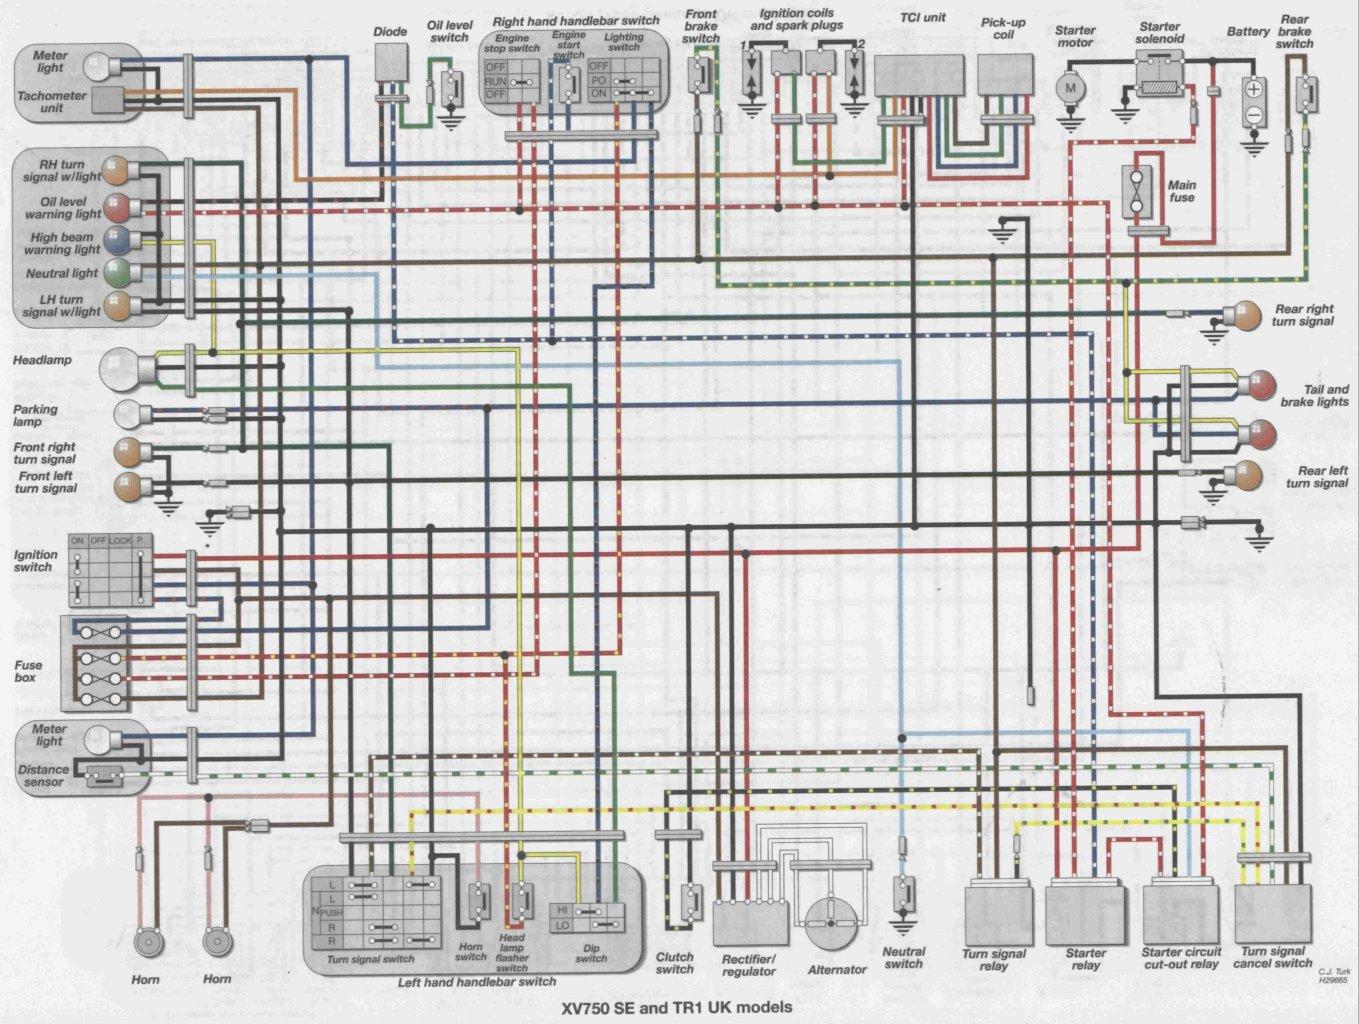 hight resolution of fuse box on yamaha virago wiring diagram name fuse box on yamaha virago wiring diagram name